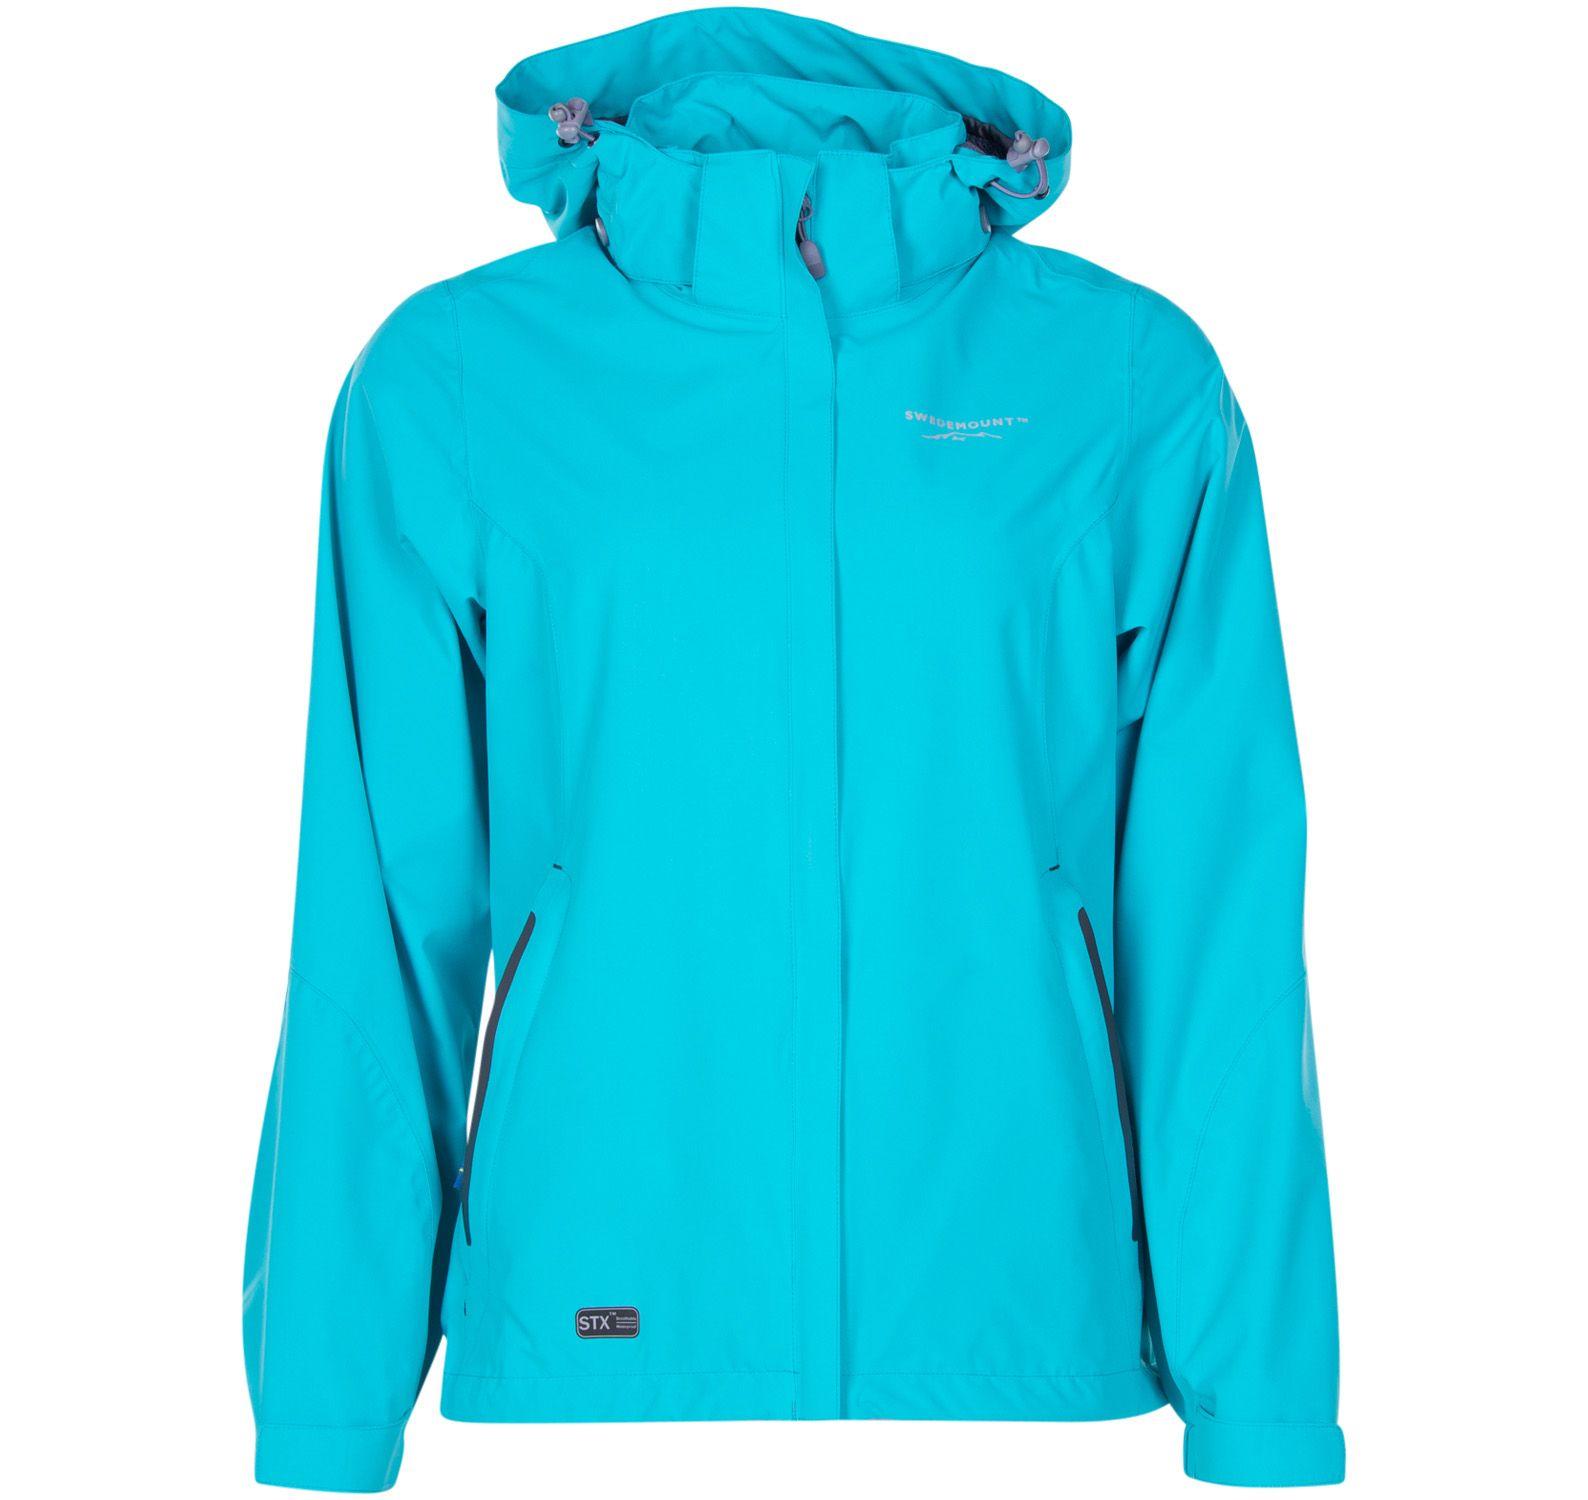 käringön jacket w, new turquoise, 36, regnkläder